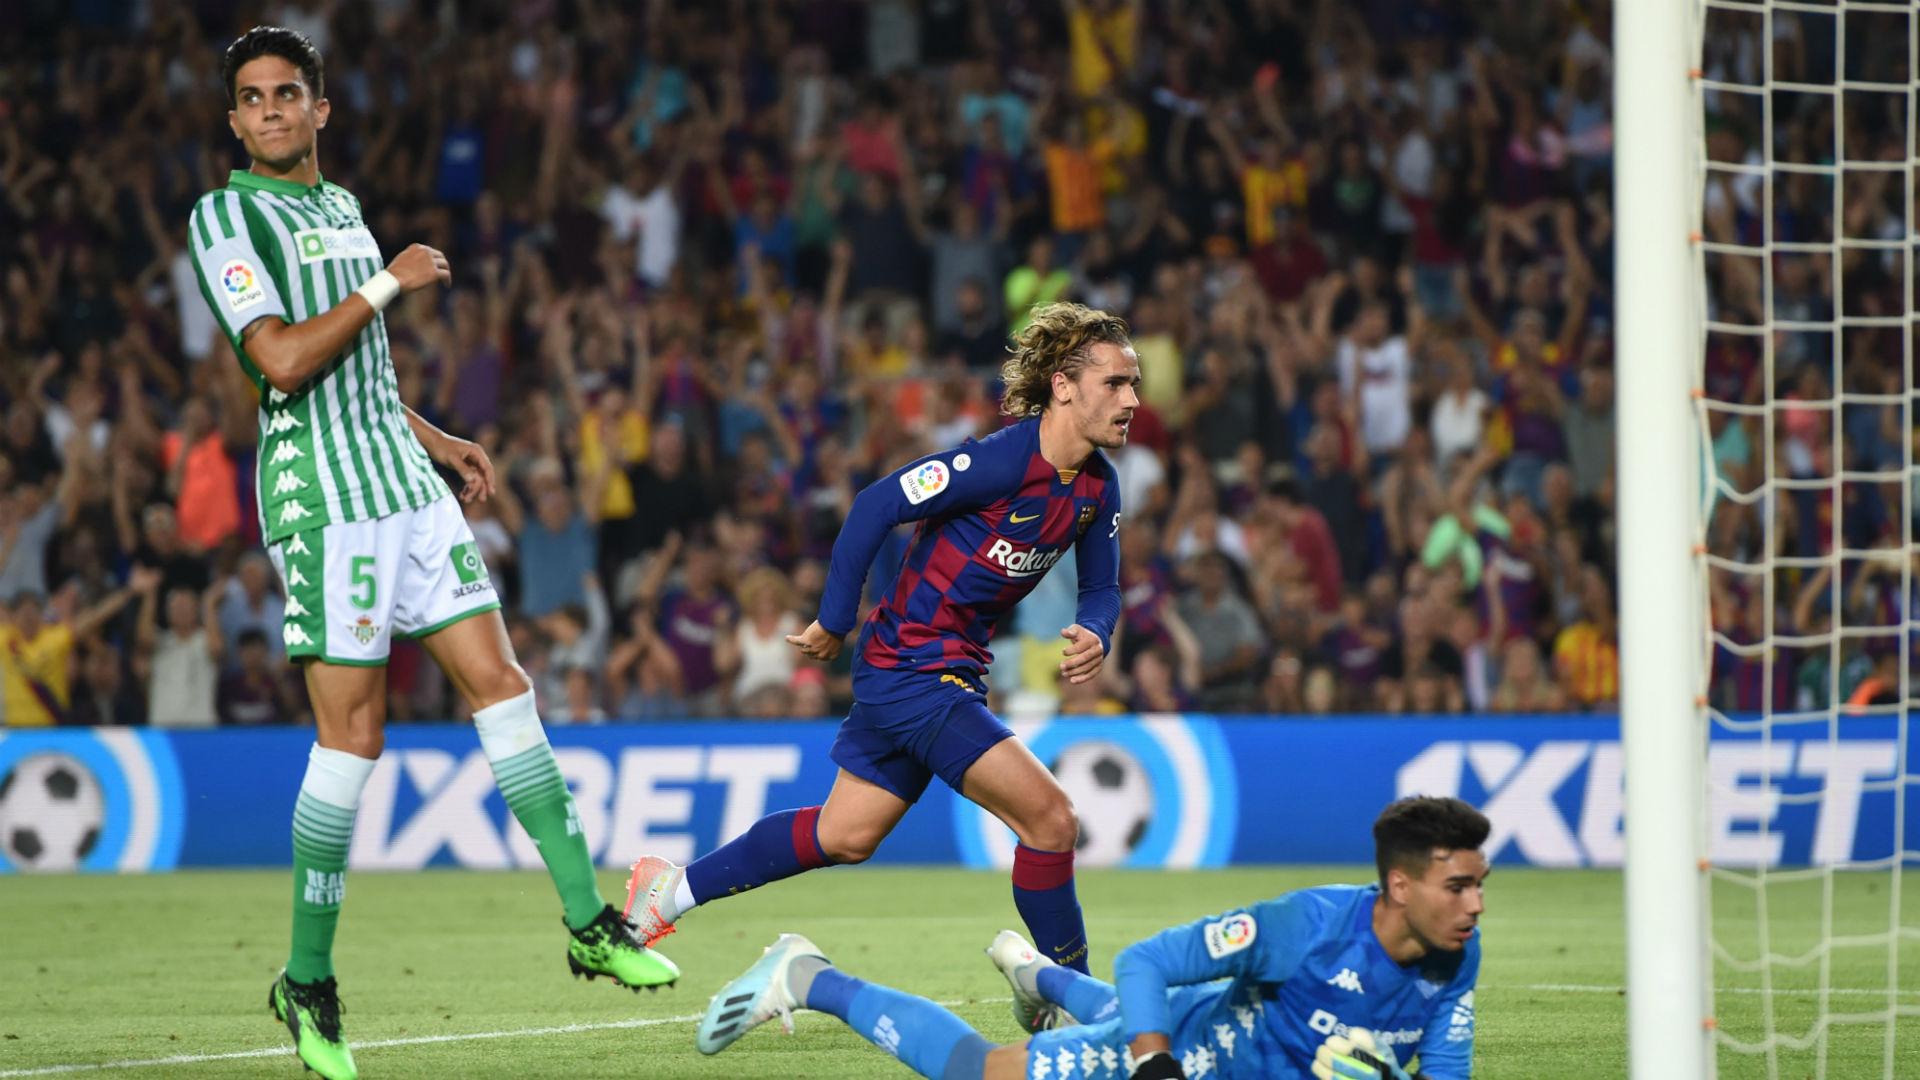 Barcelona V Real Betis Match Report 25 08 2019 Primera Division Goal Com